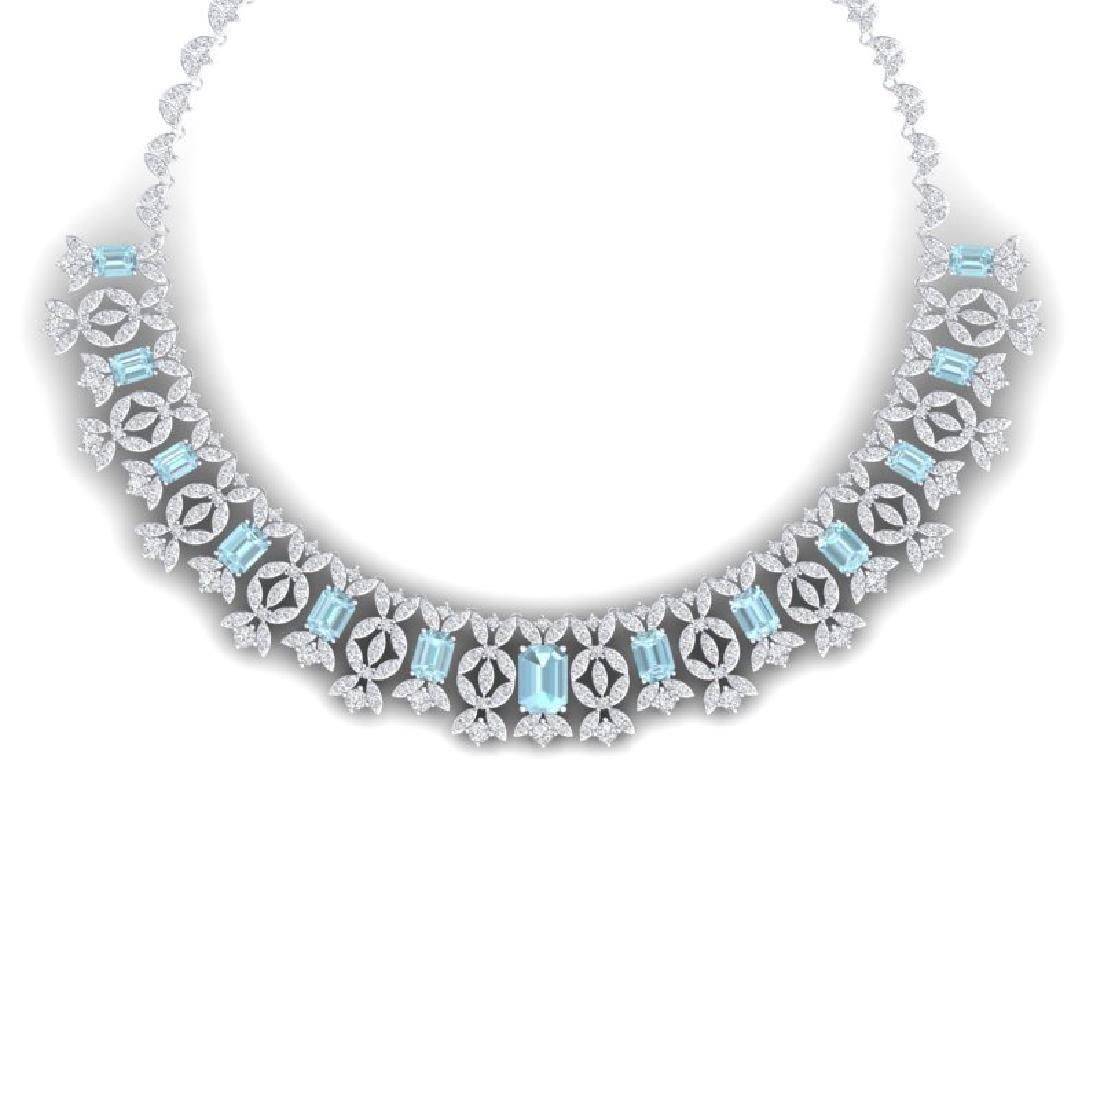 53.14 CTW Royalty Sky Topaz & VS Diamond Necklace 18K